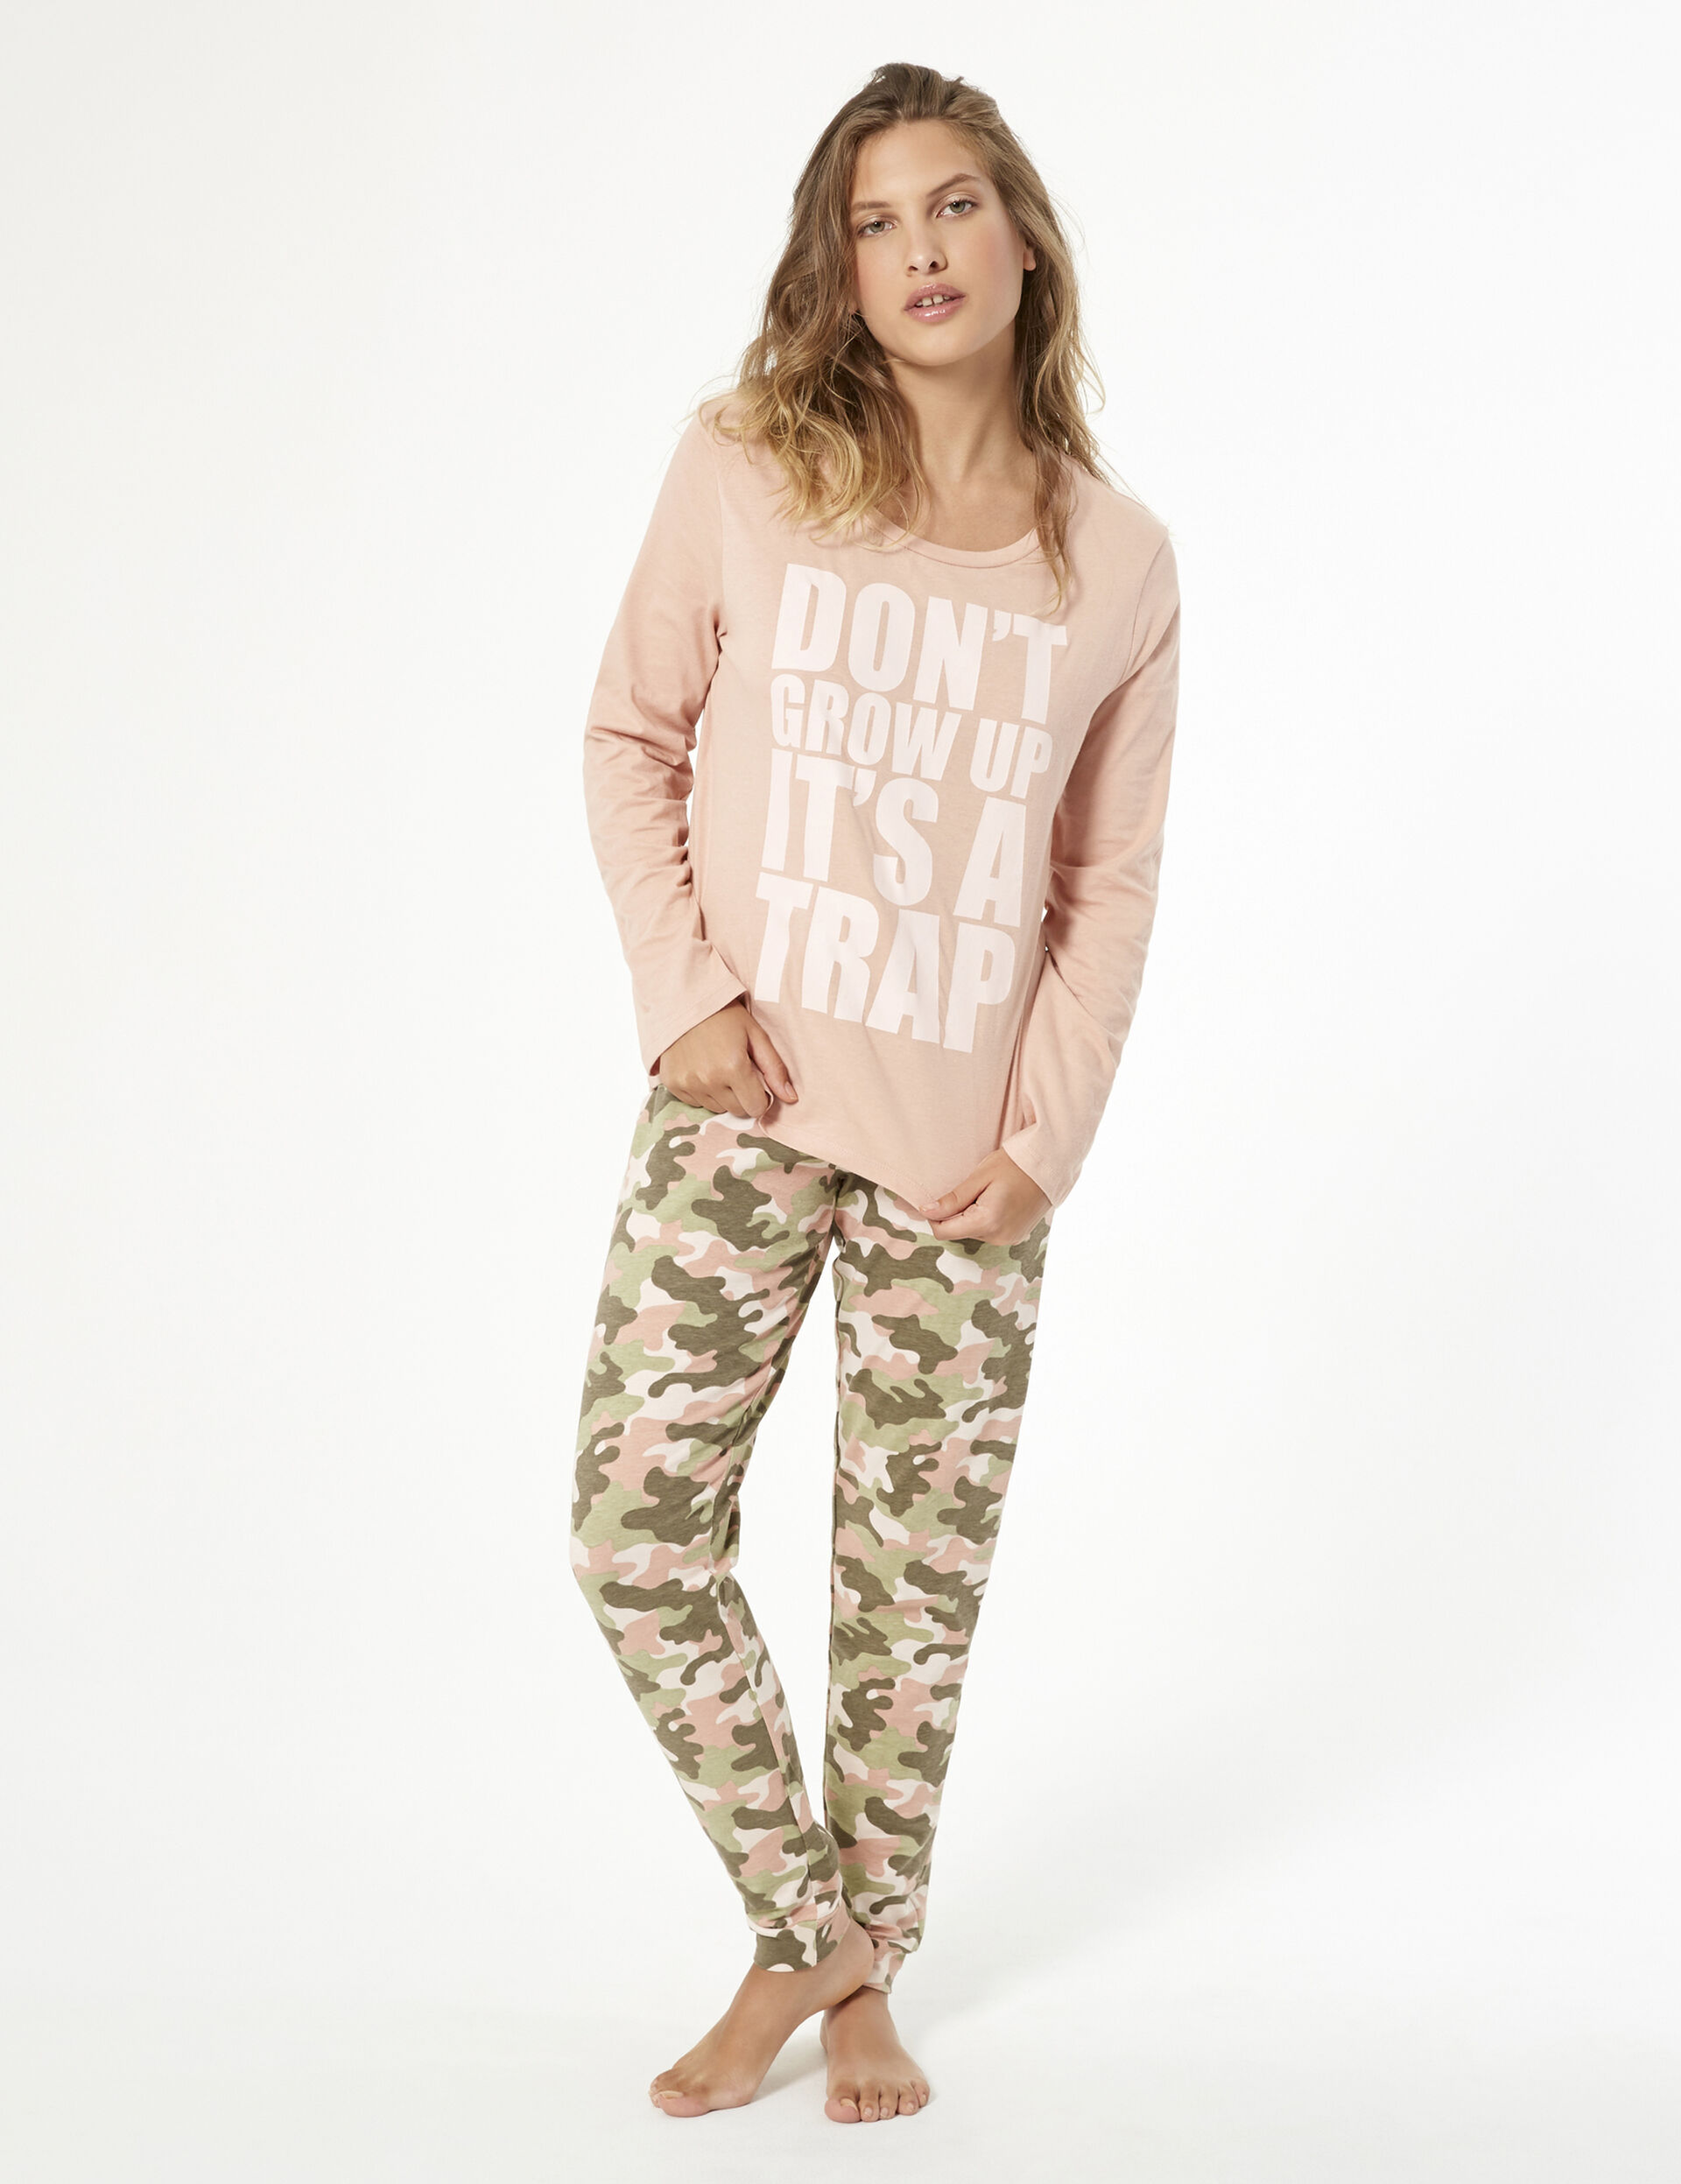 Pyjama set with slogan